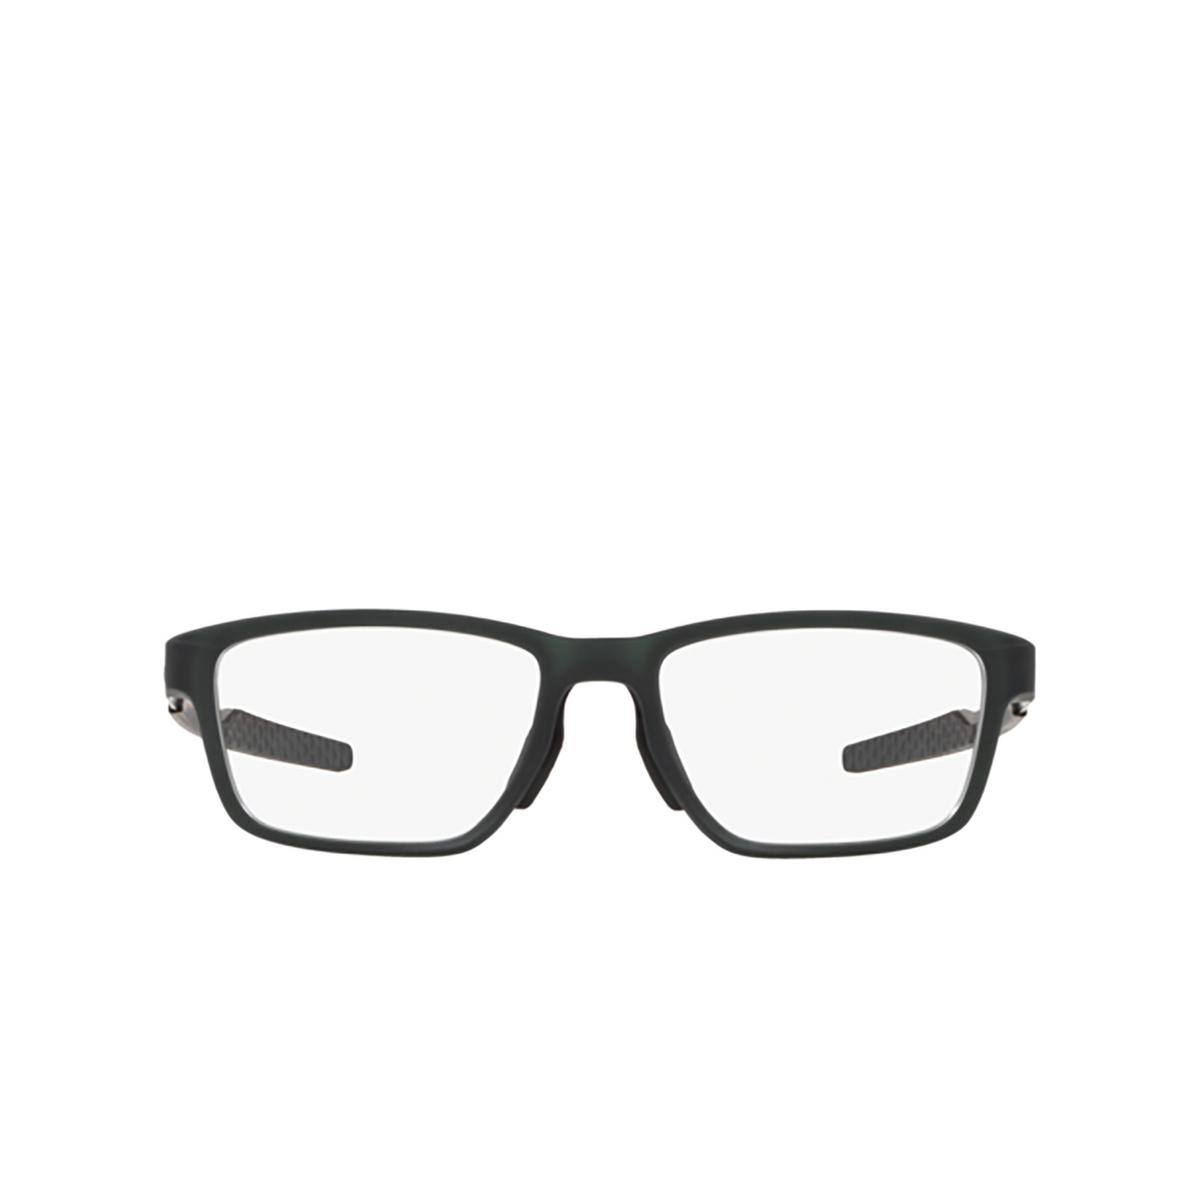 Oakley® Rectangle Eyeglasses: Metalink OX8153 color Matte Olive 815303 - front view.